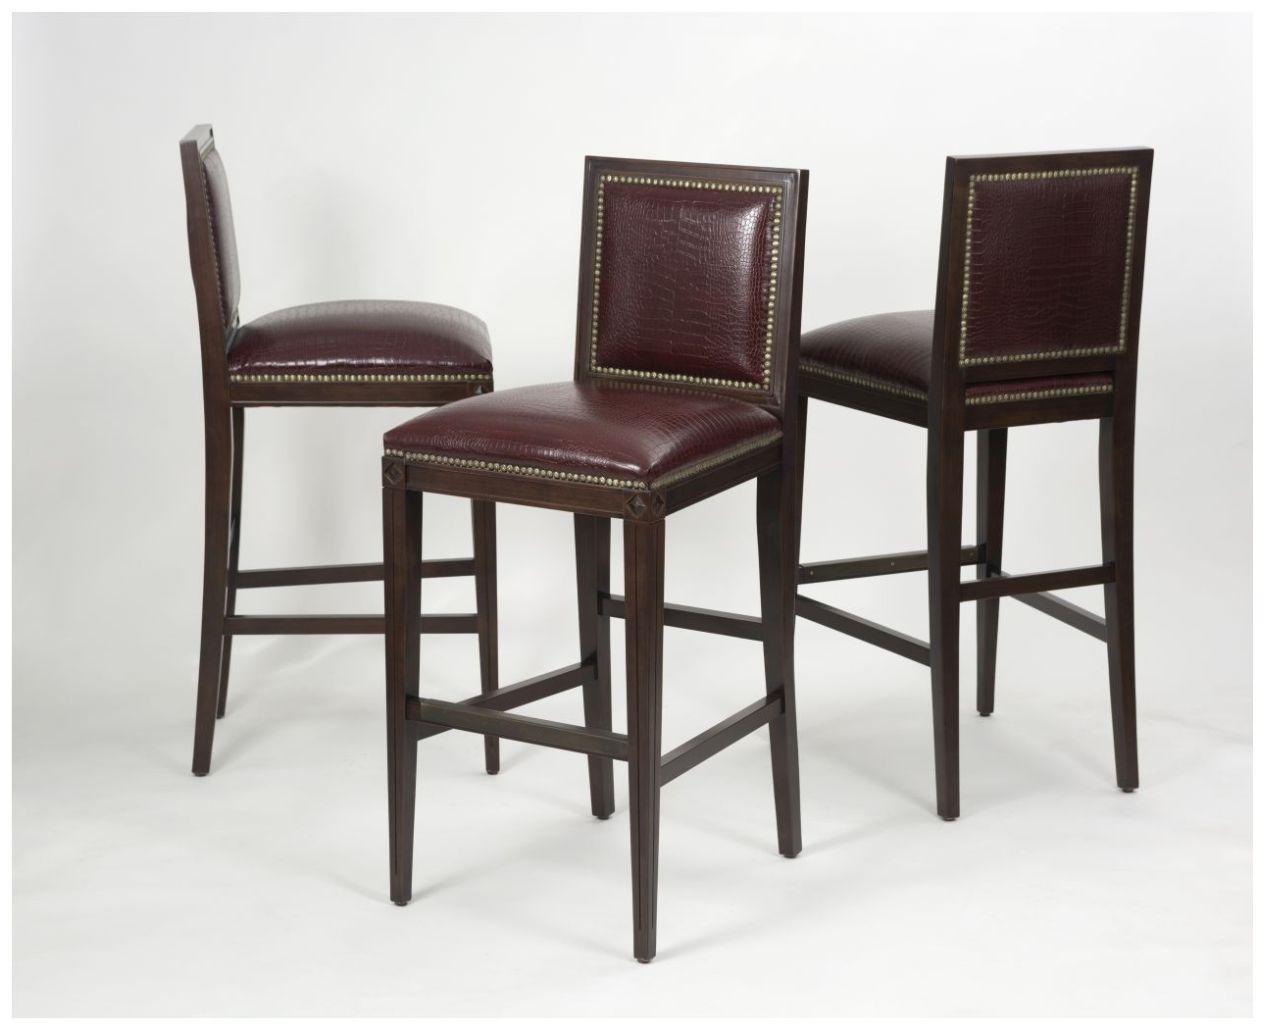 Custom Upholstered Barstools with Nailhead Trim